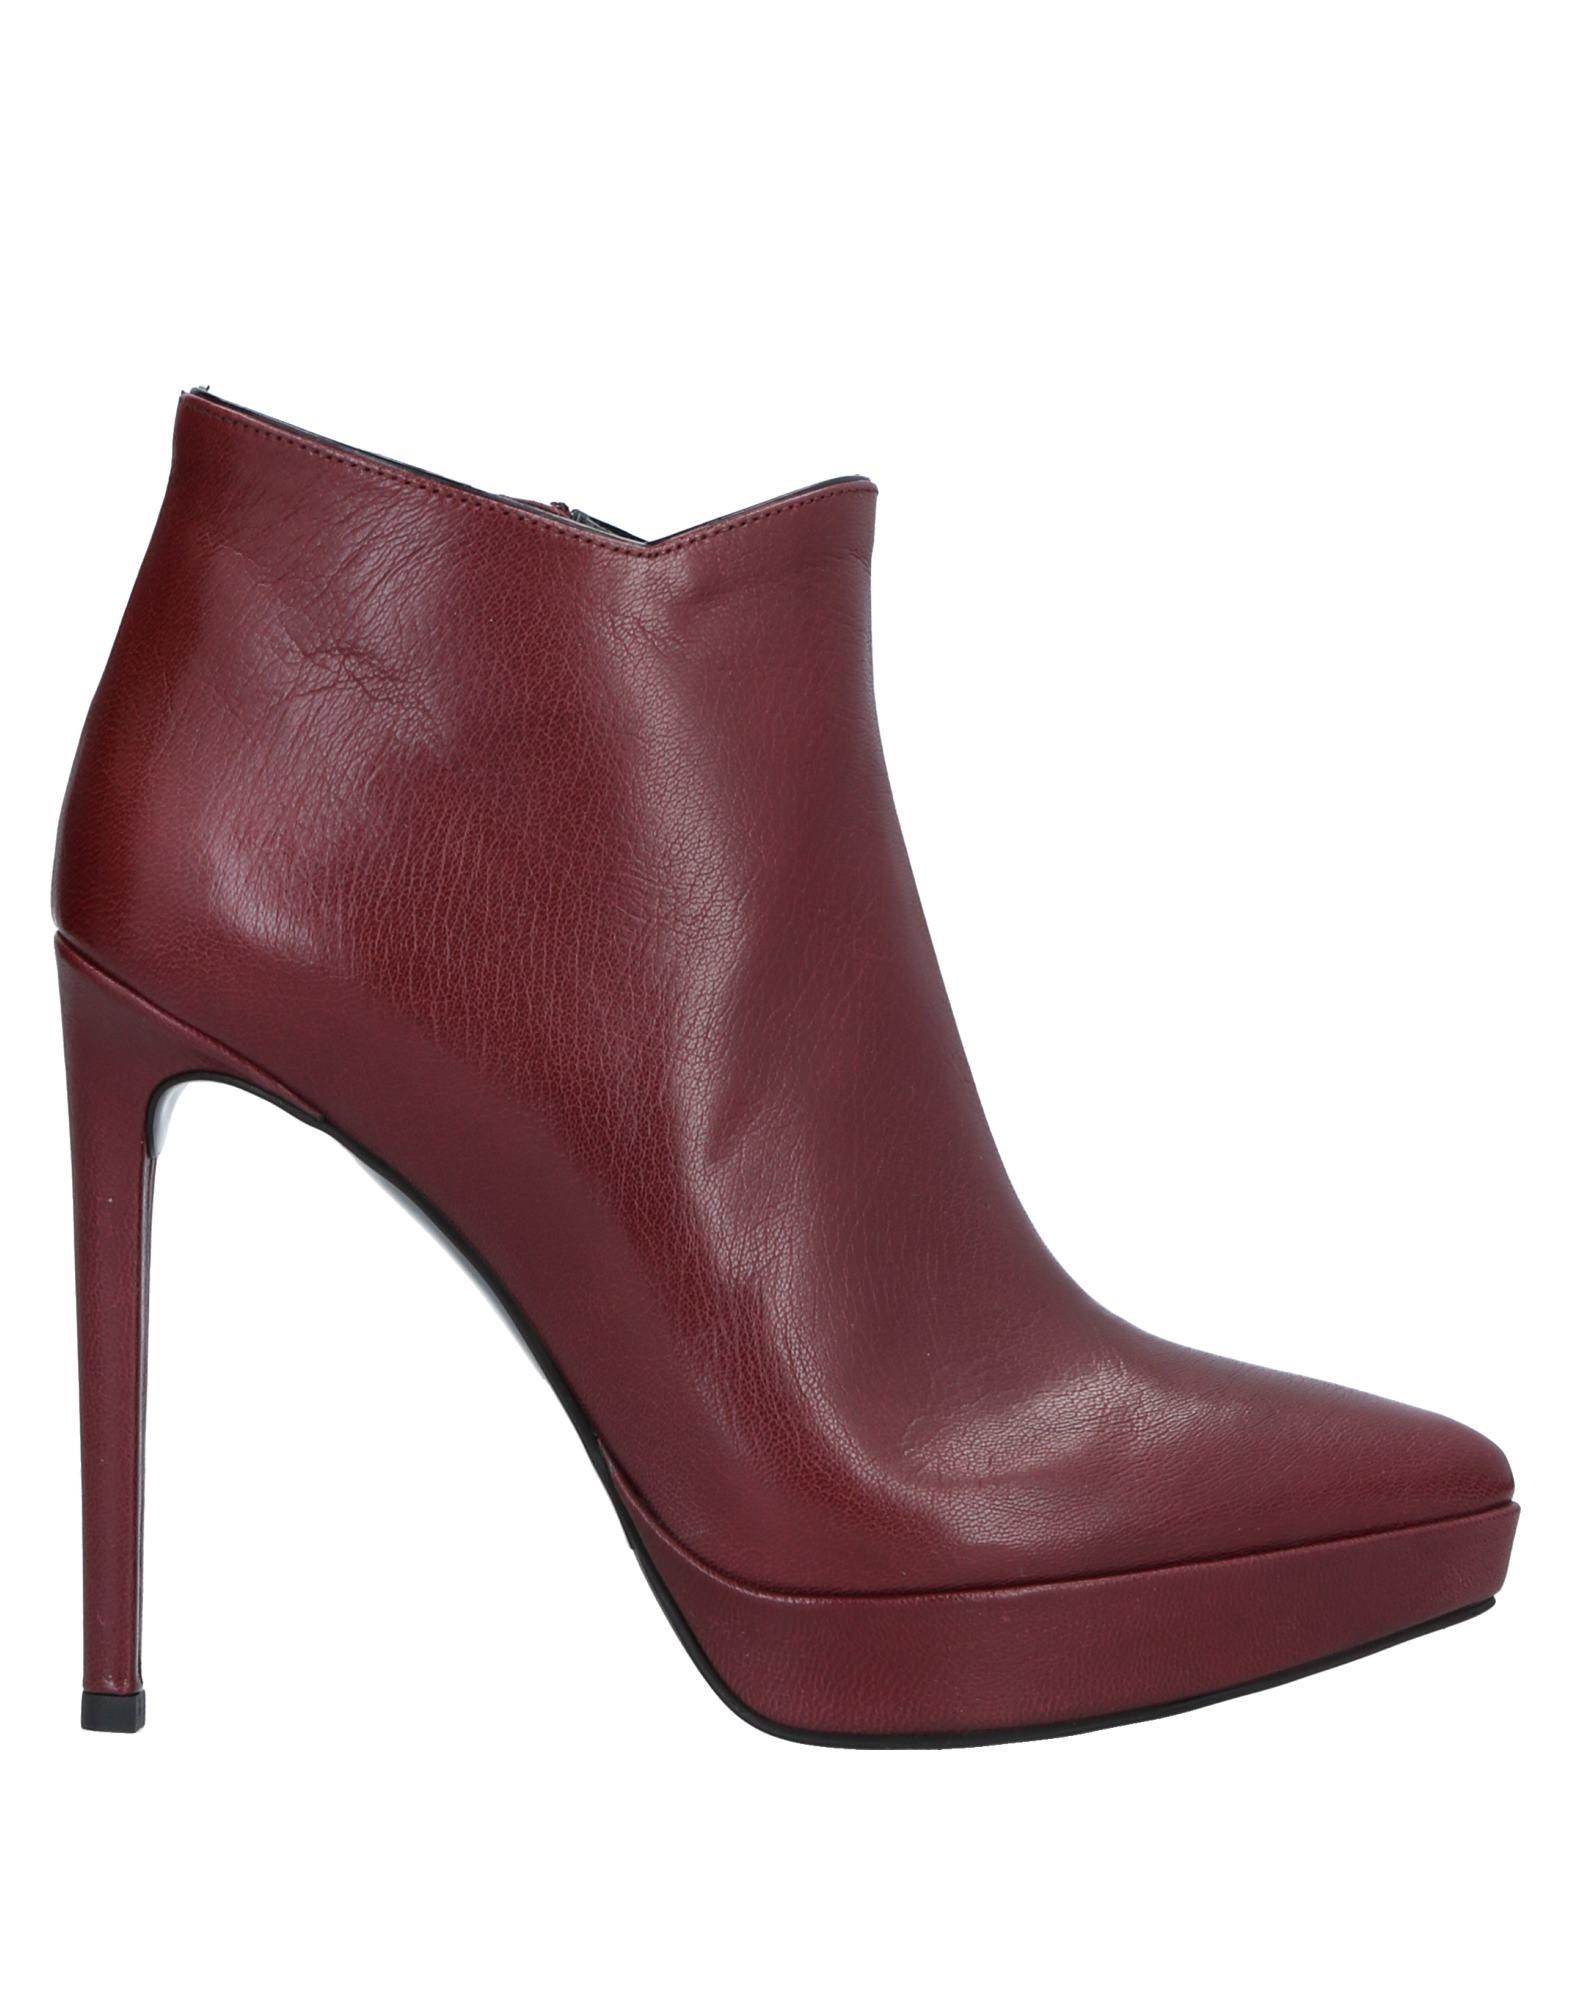 Gianni Marra 11543455HGGut Stiefelette Damen  11543455HGGut Marra aussehende strapazierfähige Schuhe 521daa